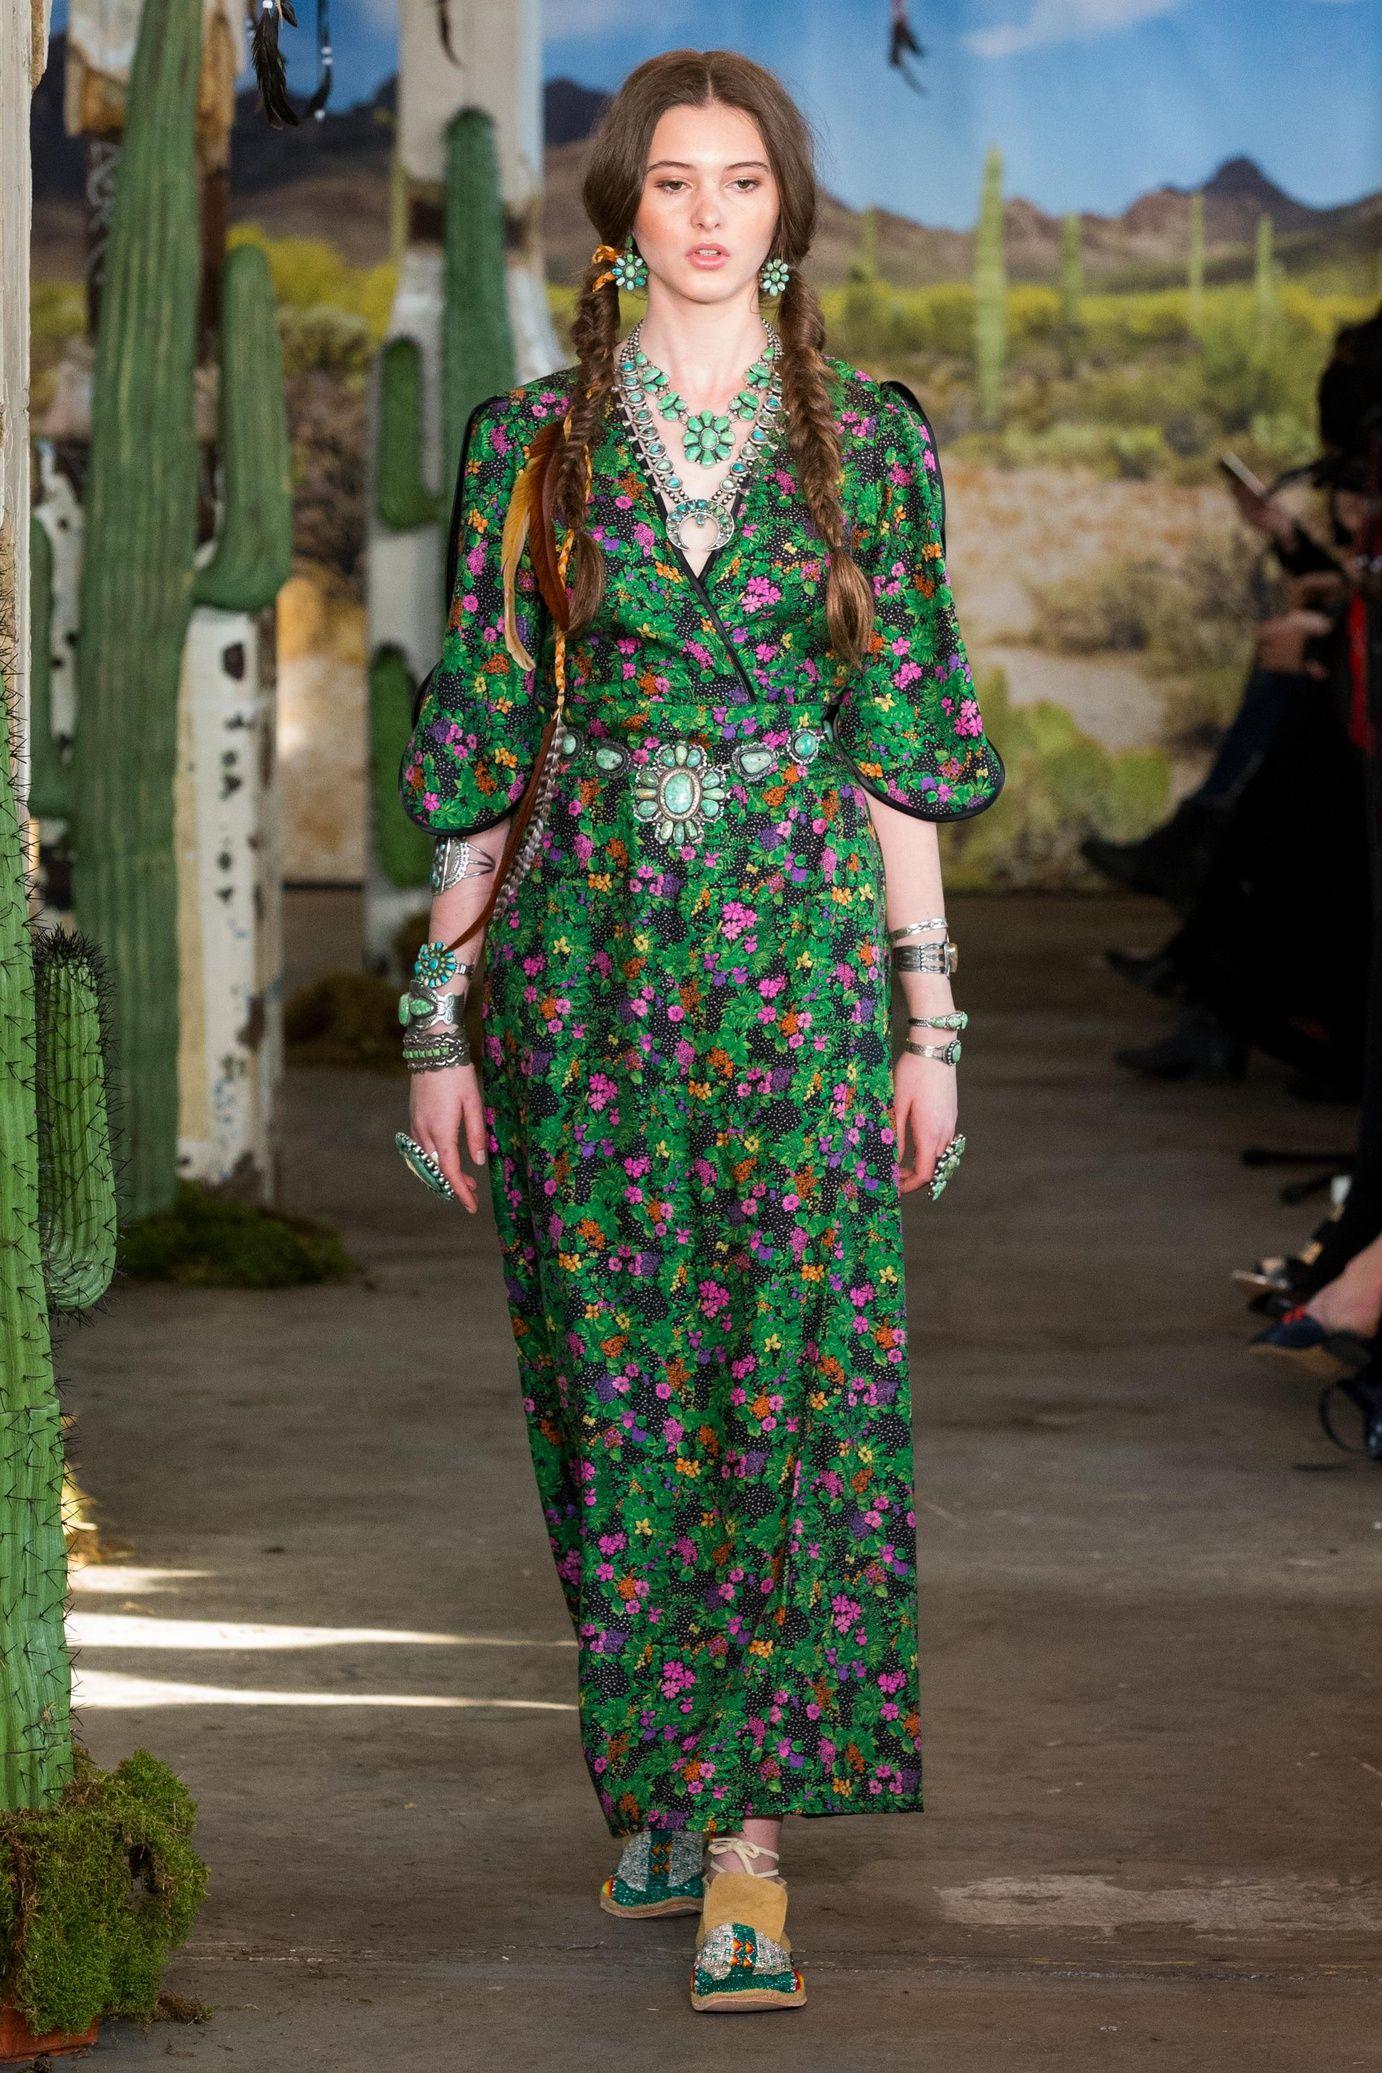 Défilés | Fall Fashion 2017 | Autumn fashion 2018, Fashion ...